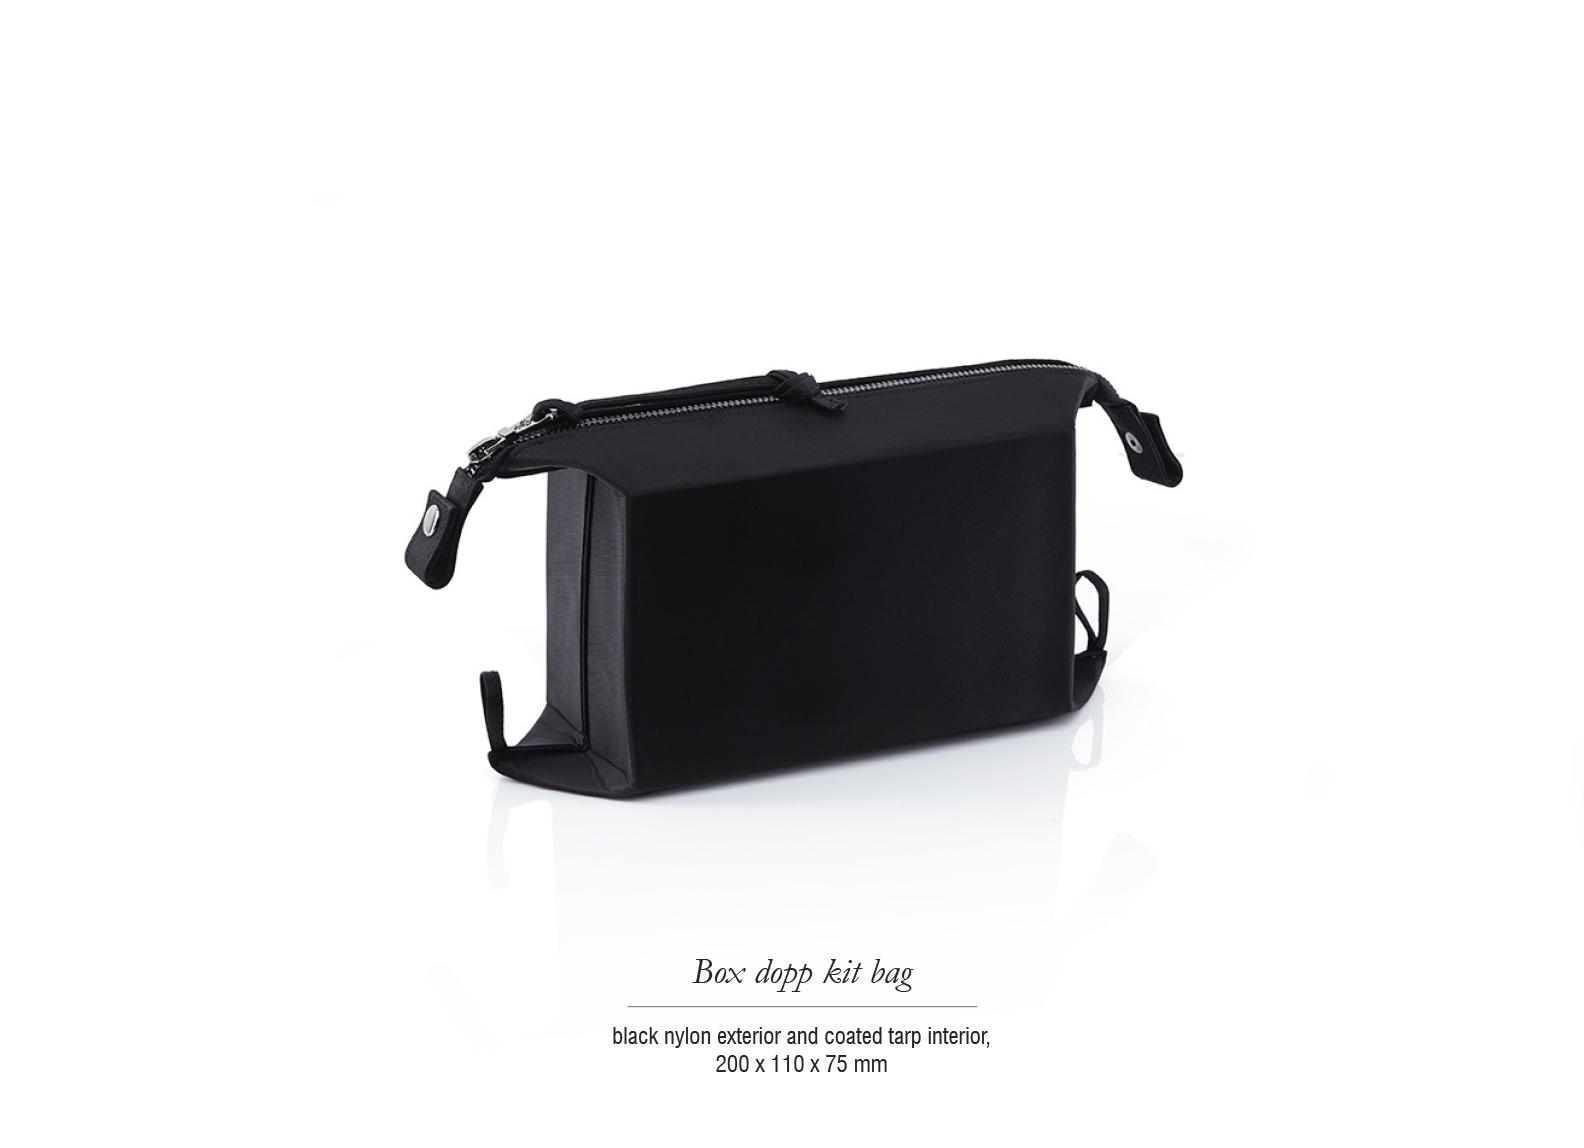 Amenity bags catalogue 2016_SHcollection_V6 104.jpg